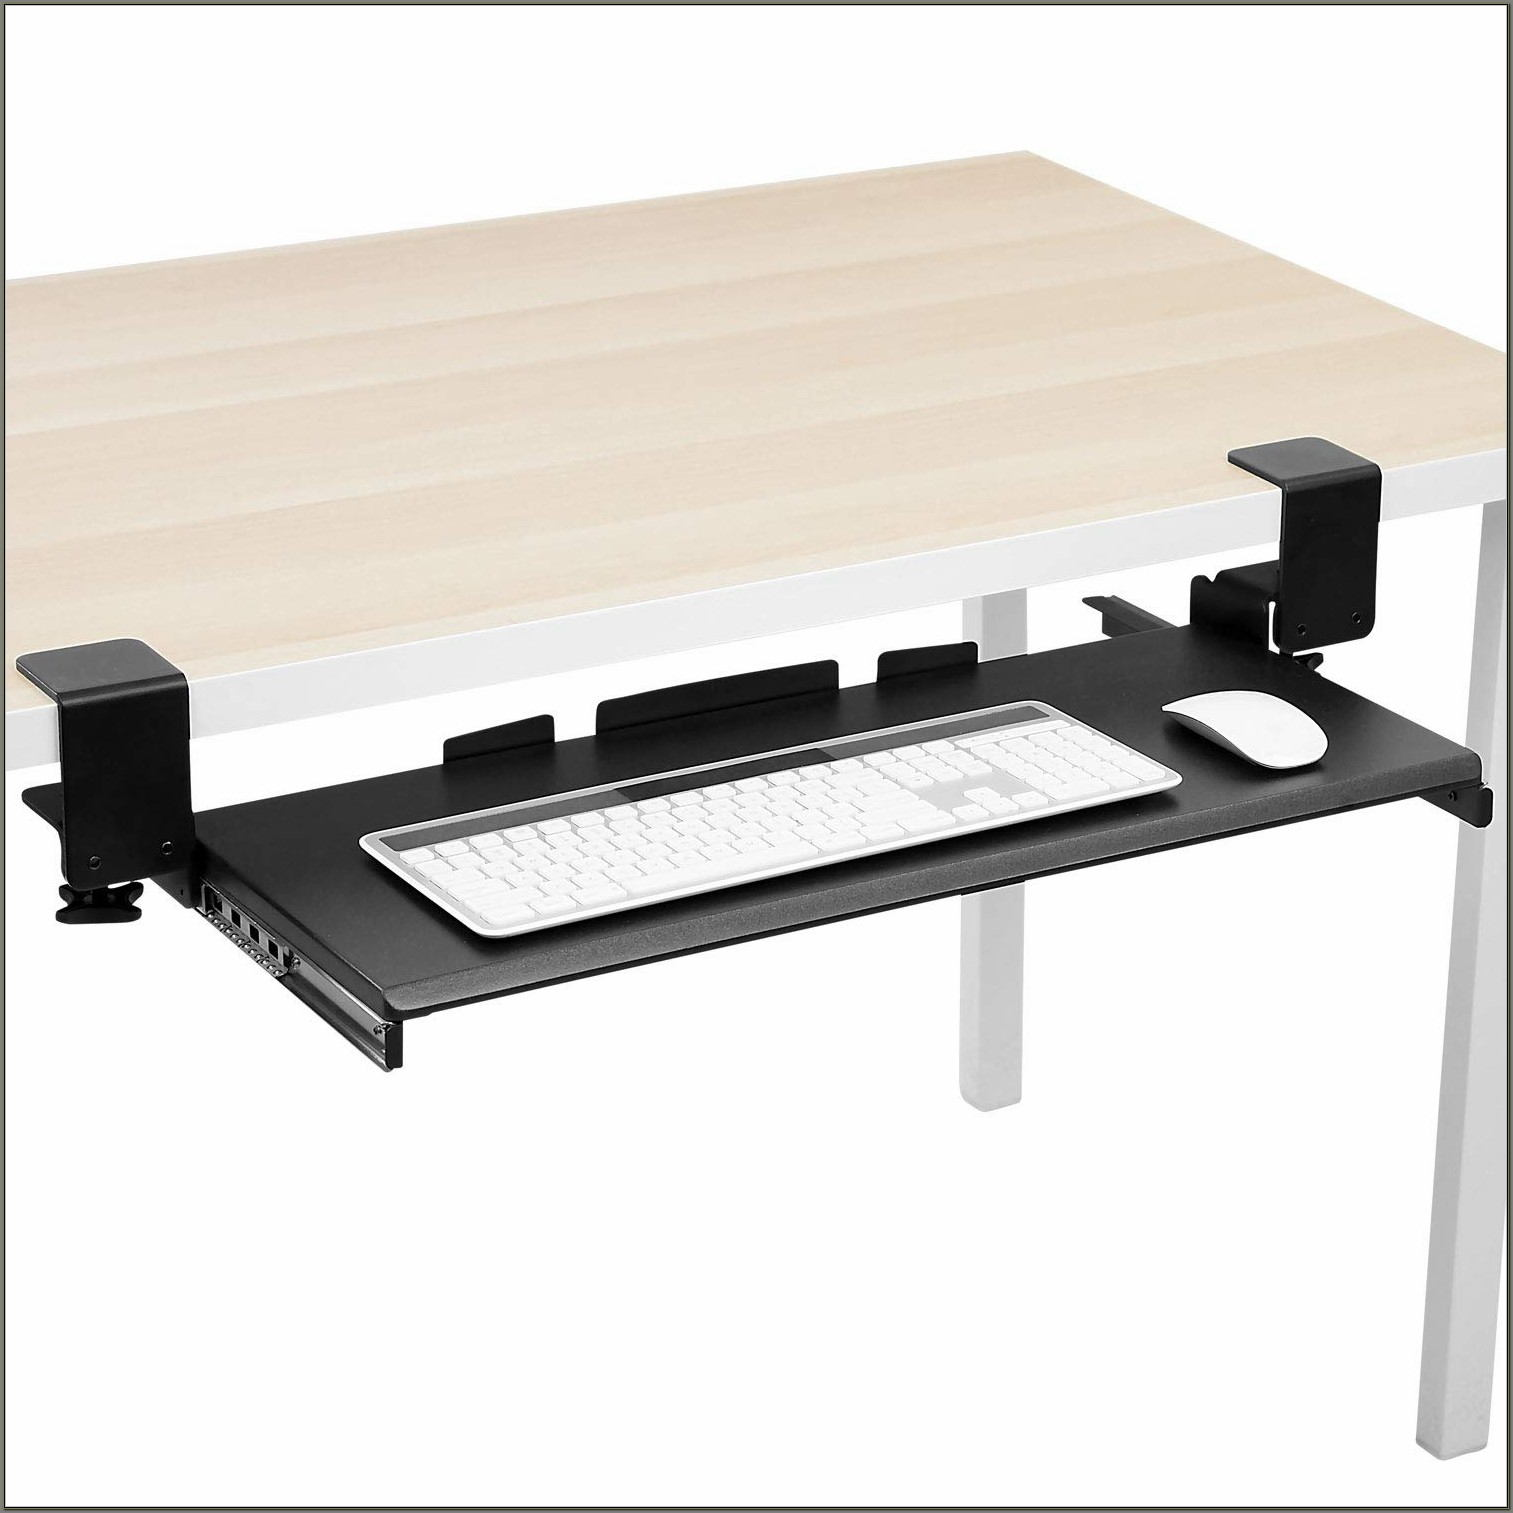 Keyboard Mount Under Desk